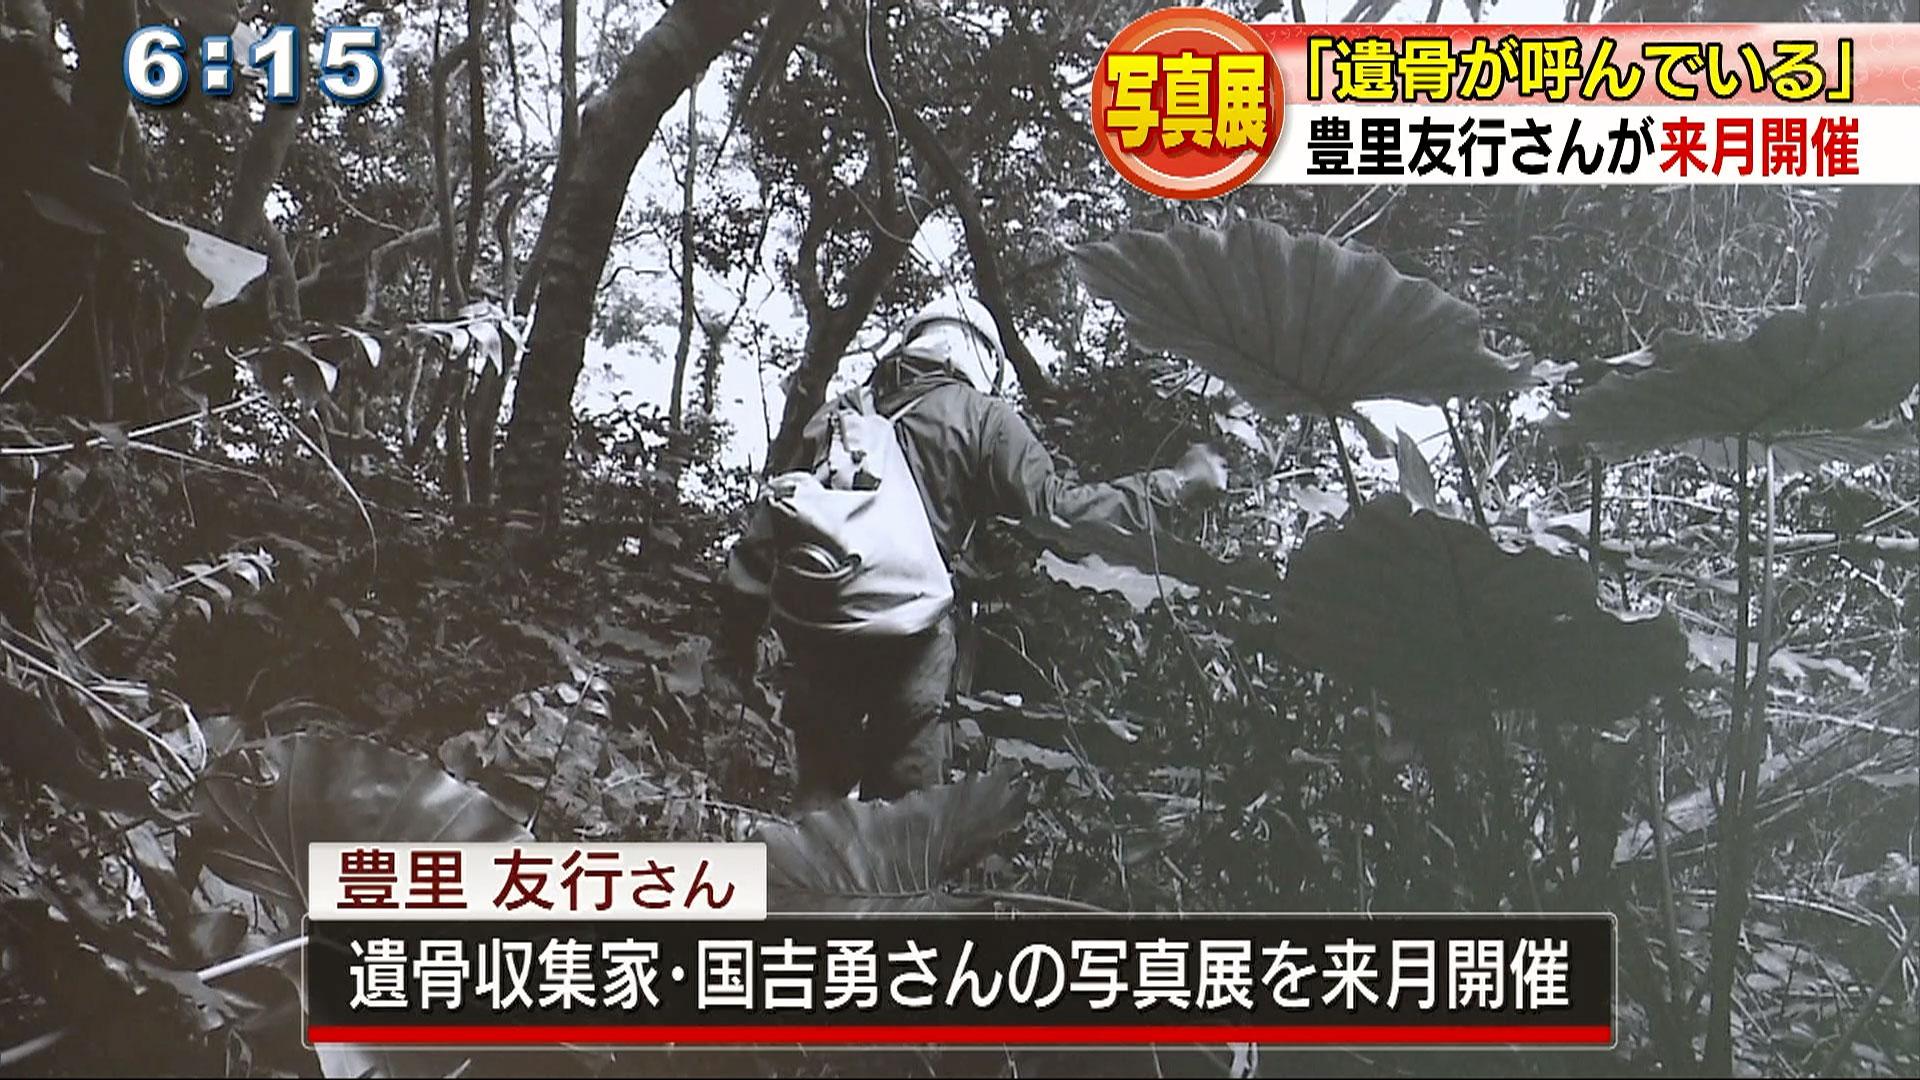 写真家・豊里友行が伝える遺骨収集家・国吉勇